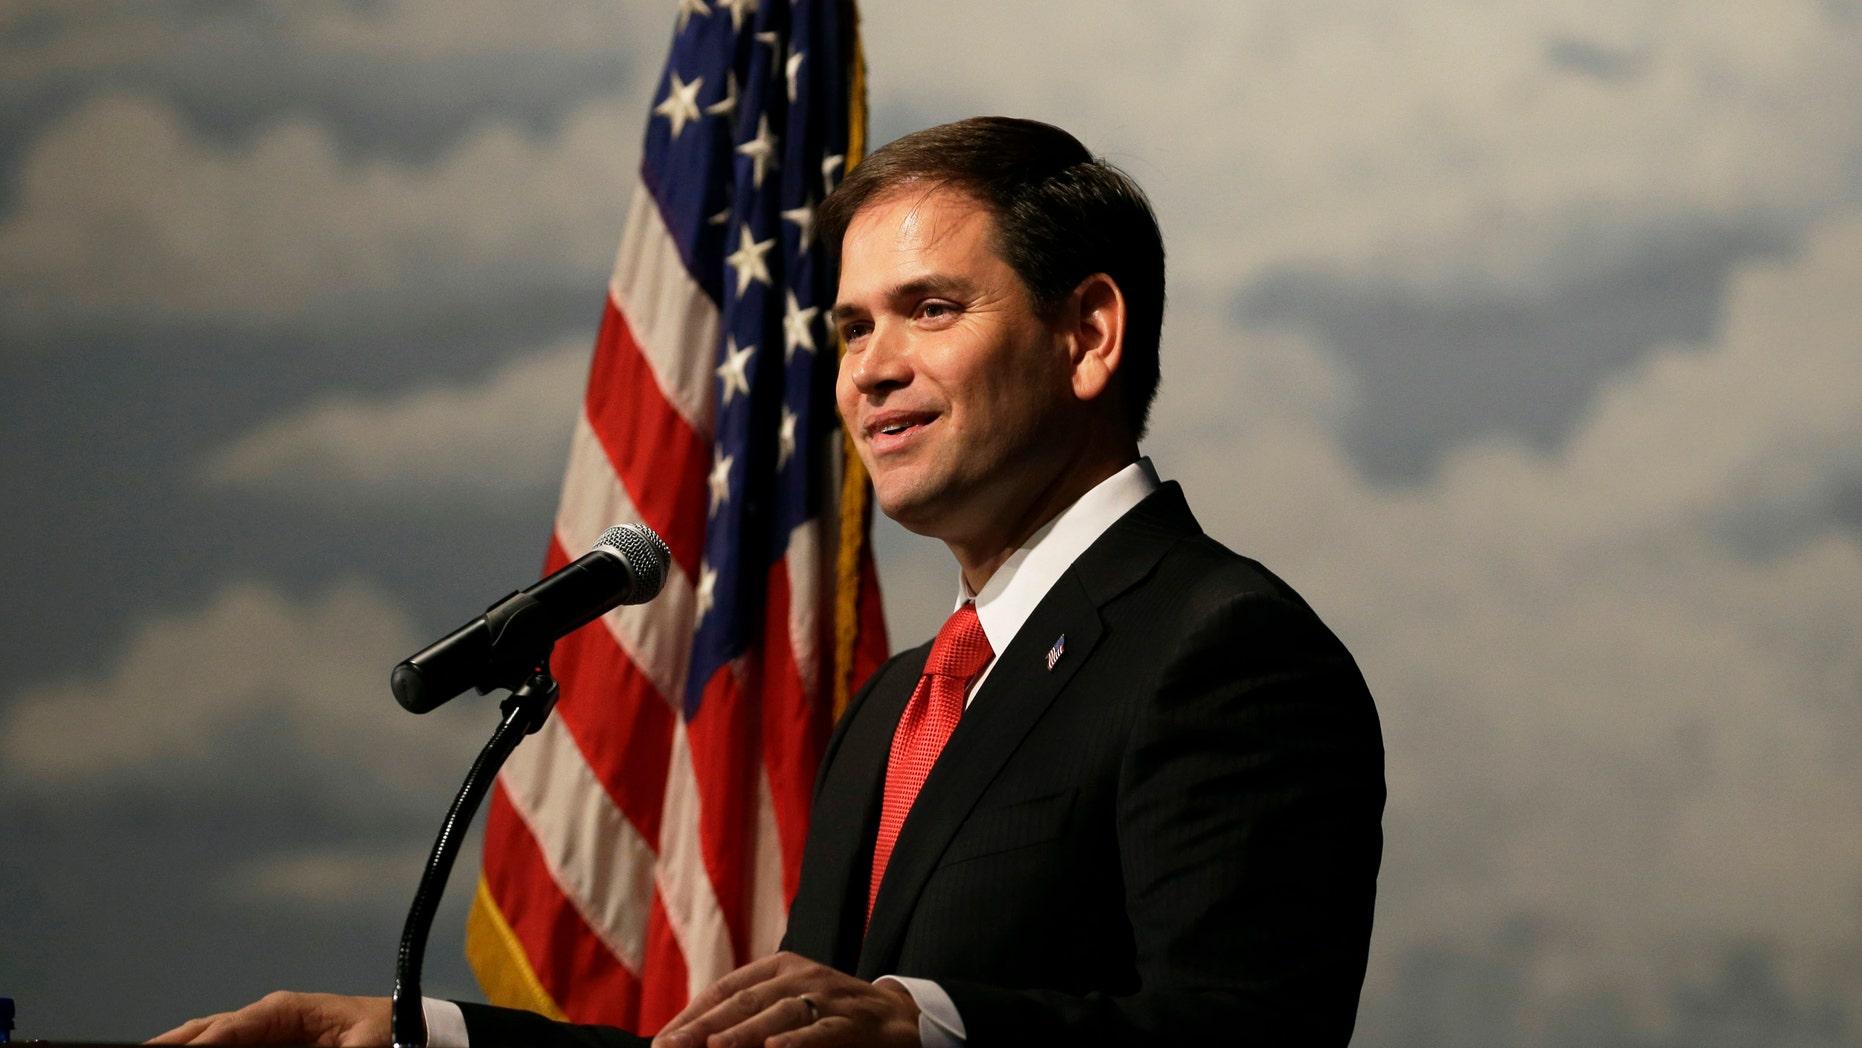 FILE: Nov. 17, 2012: Sen. Marco Rubio, R-Fla., speaks during Iowa Gov. Terry Branstad's annual birthday fundraiser.